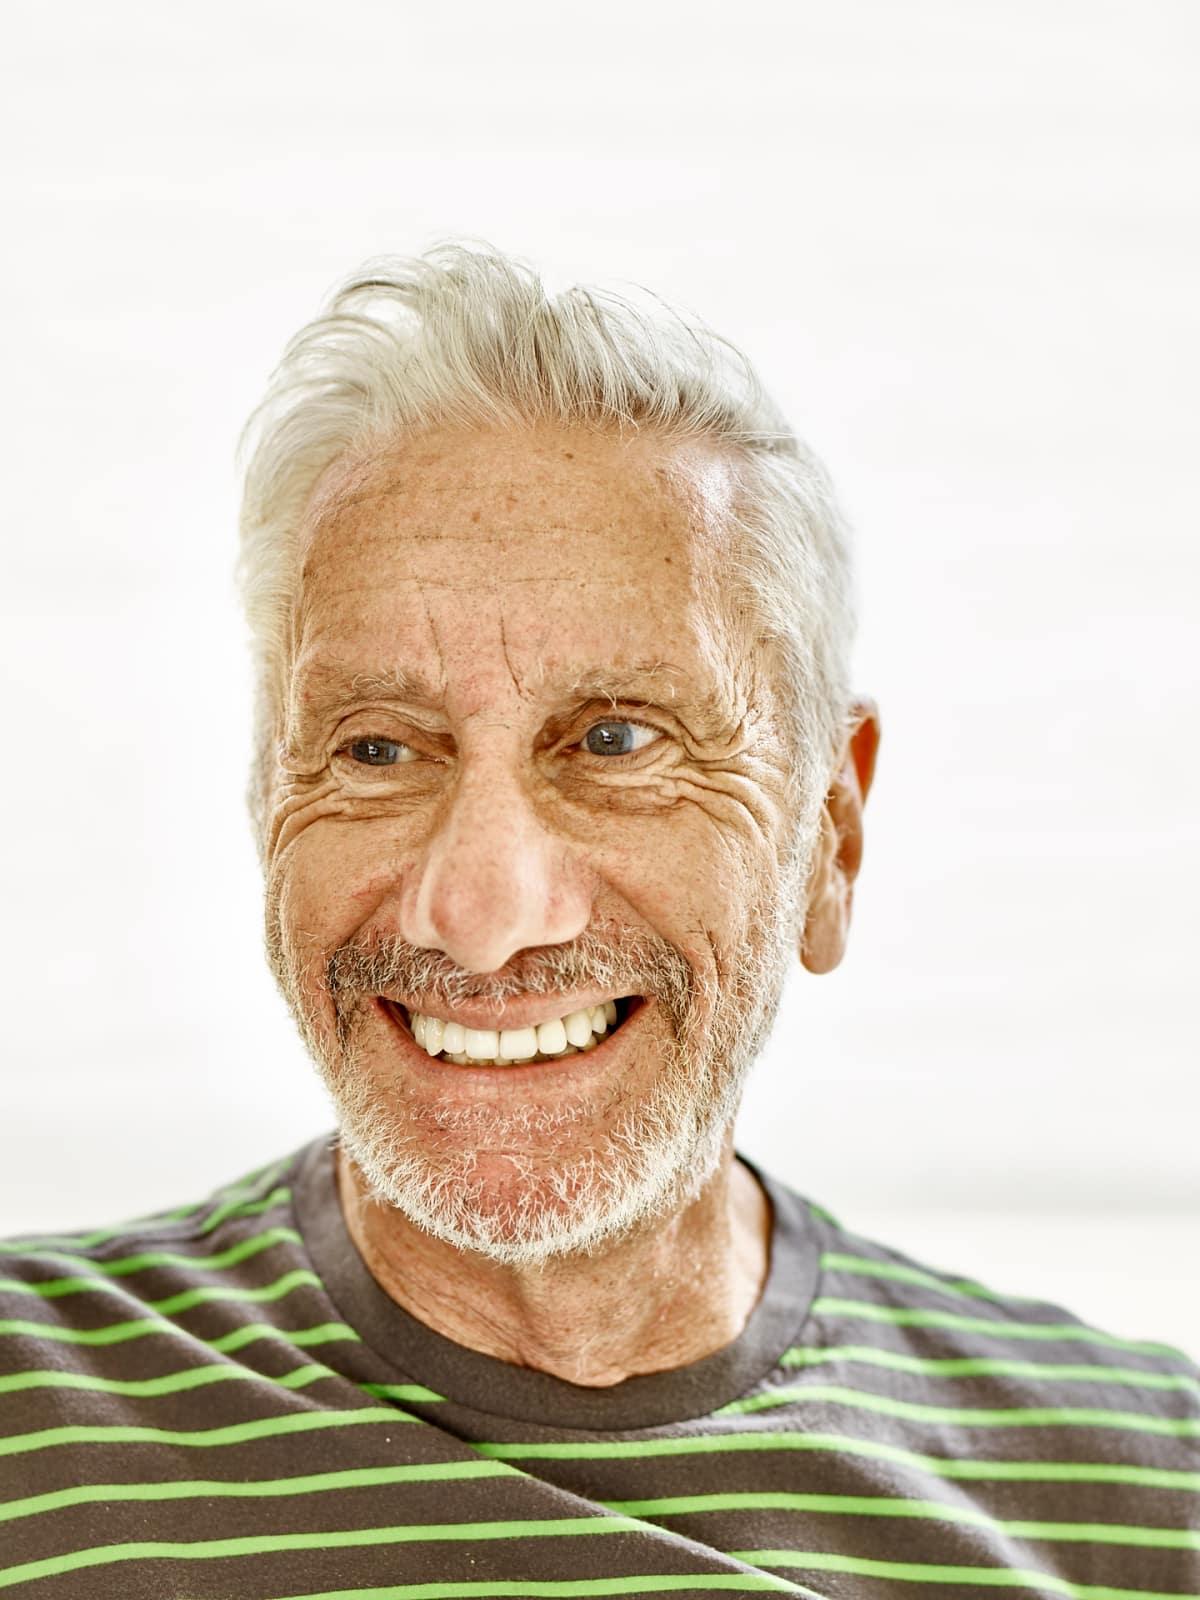 Tractorbeam Owner Peter Benanti